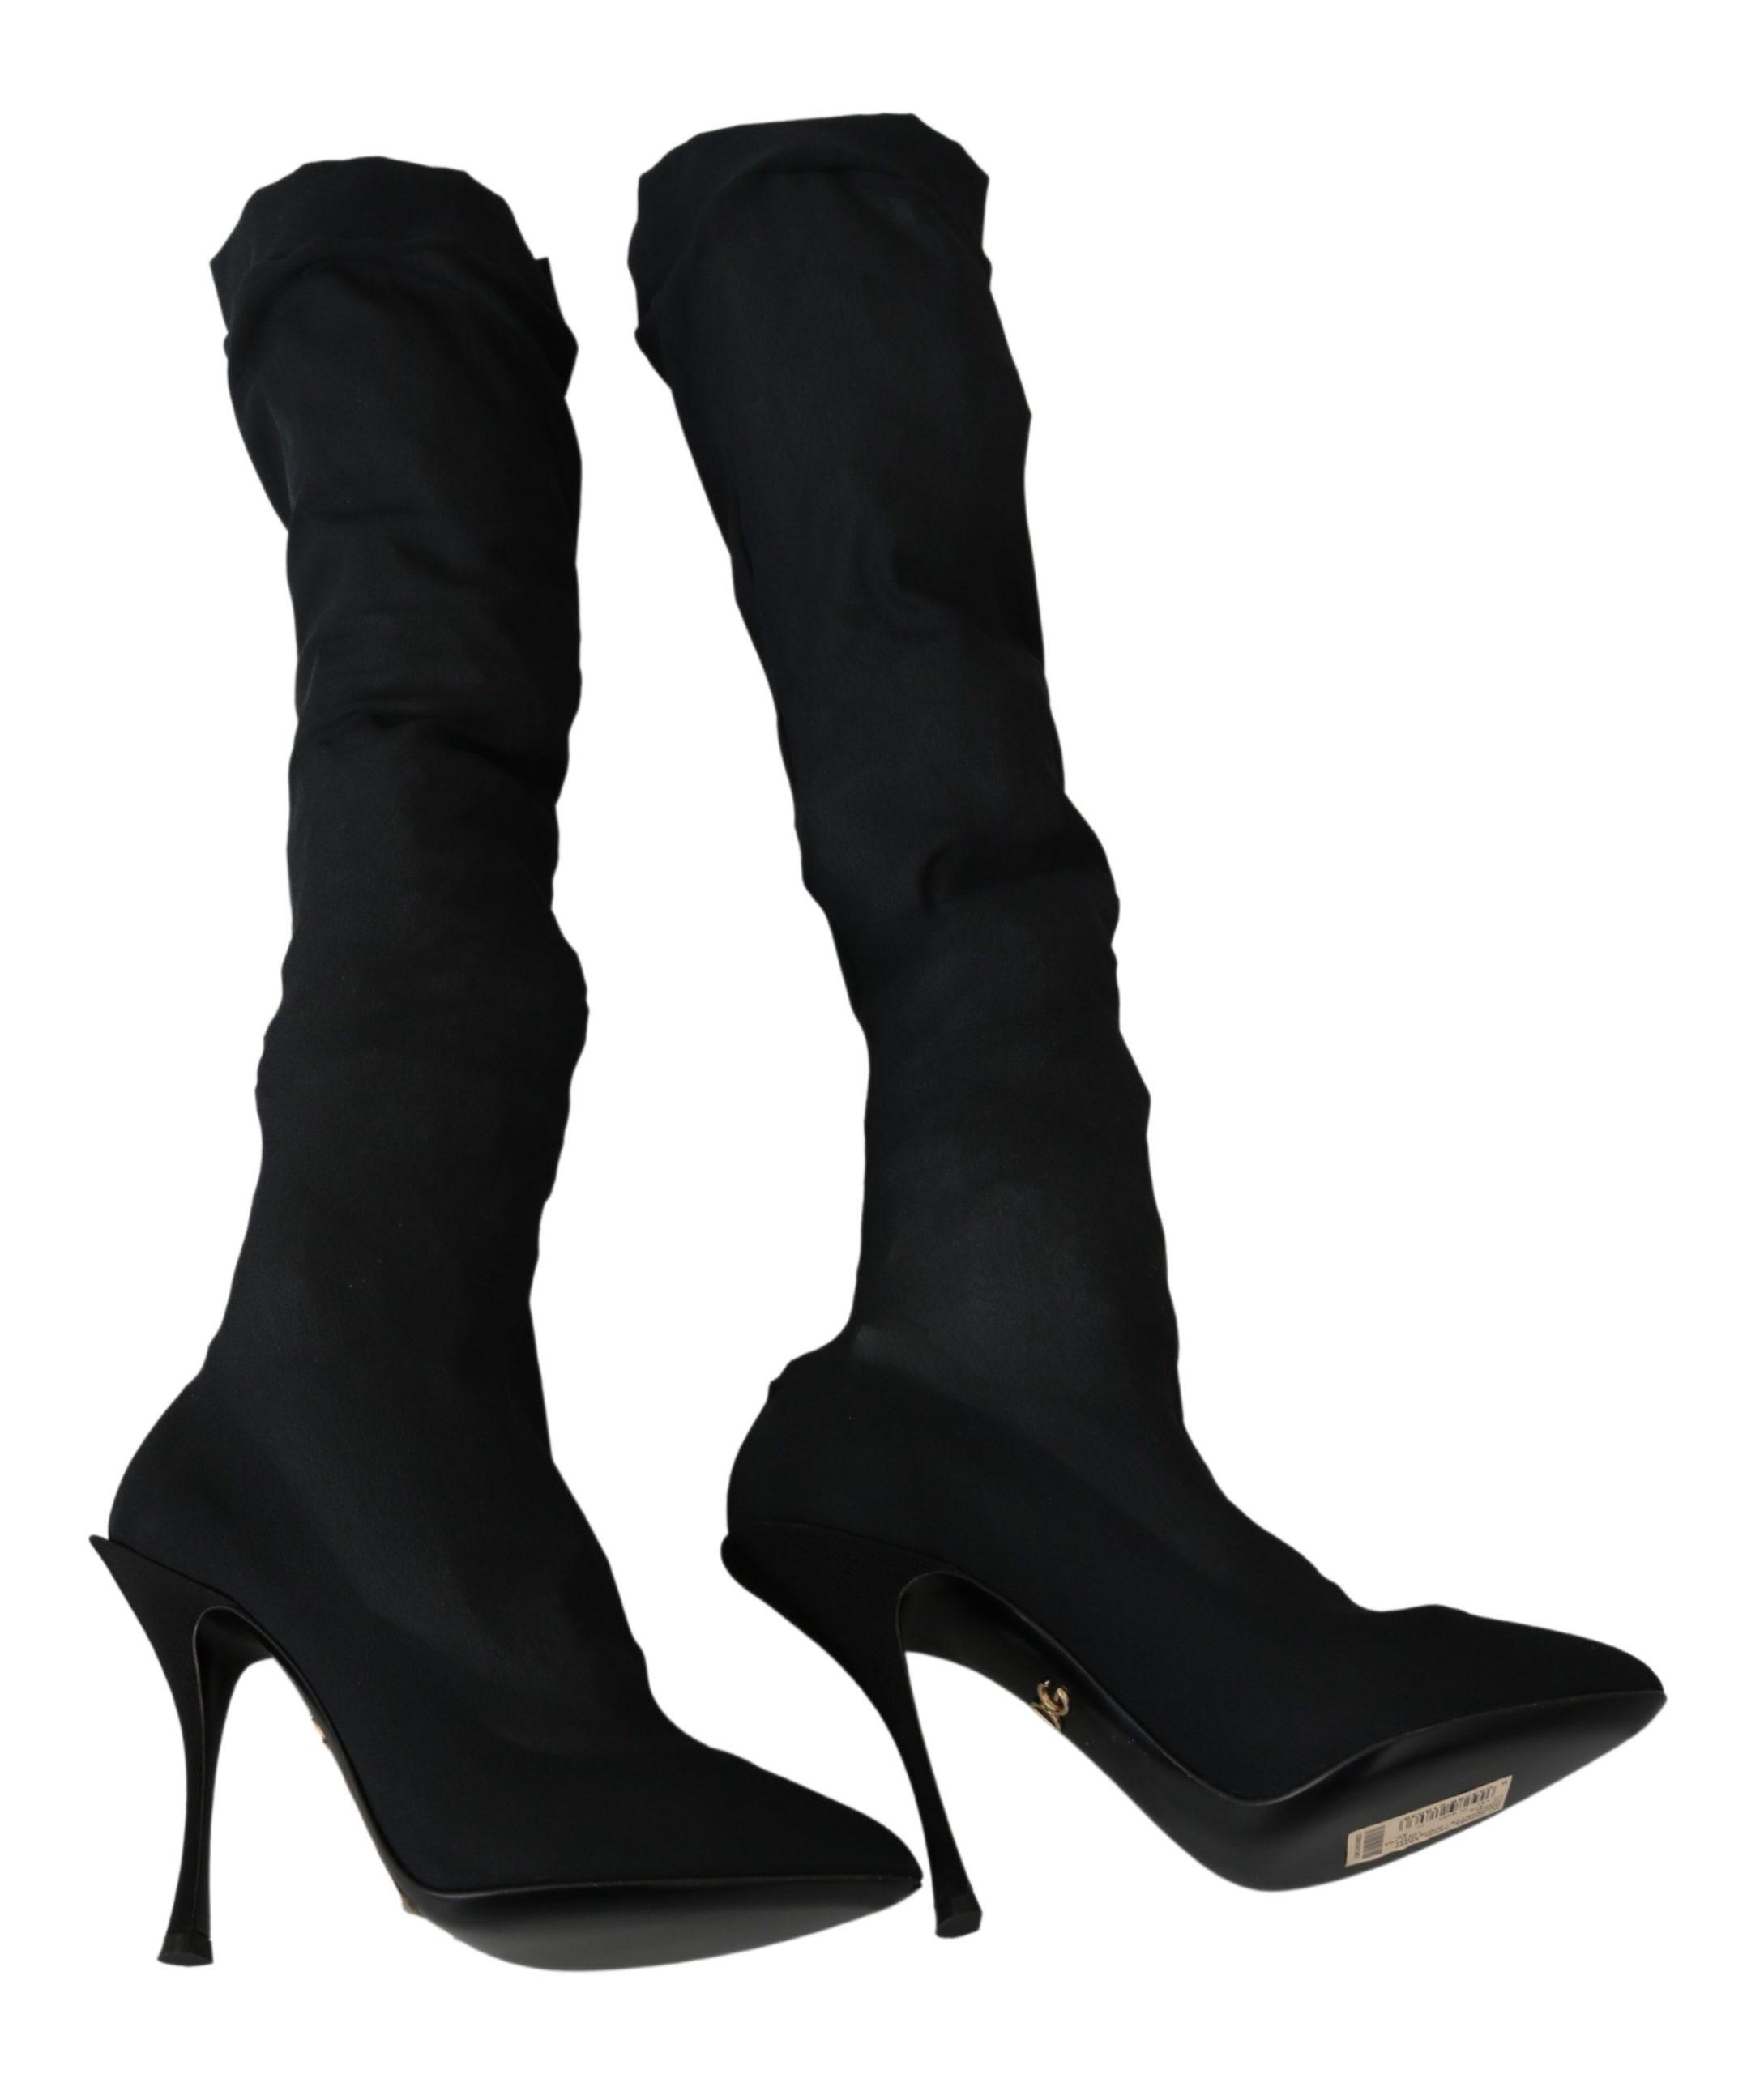 Dolce & Gabbana Women's Tulle Stretch Knee Boots Black LA6916 - EU37/US6.5